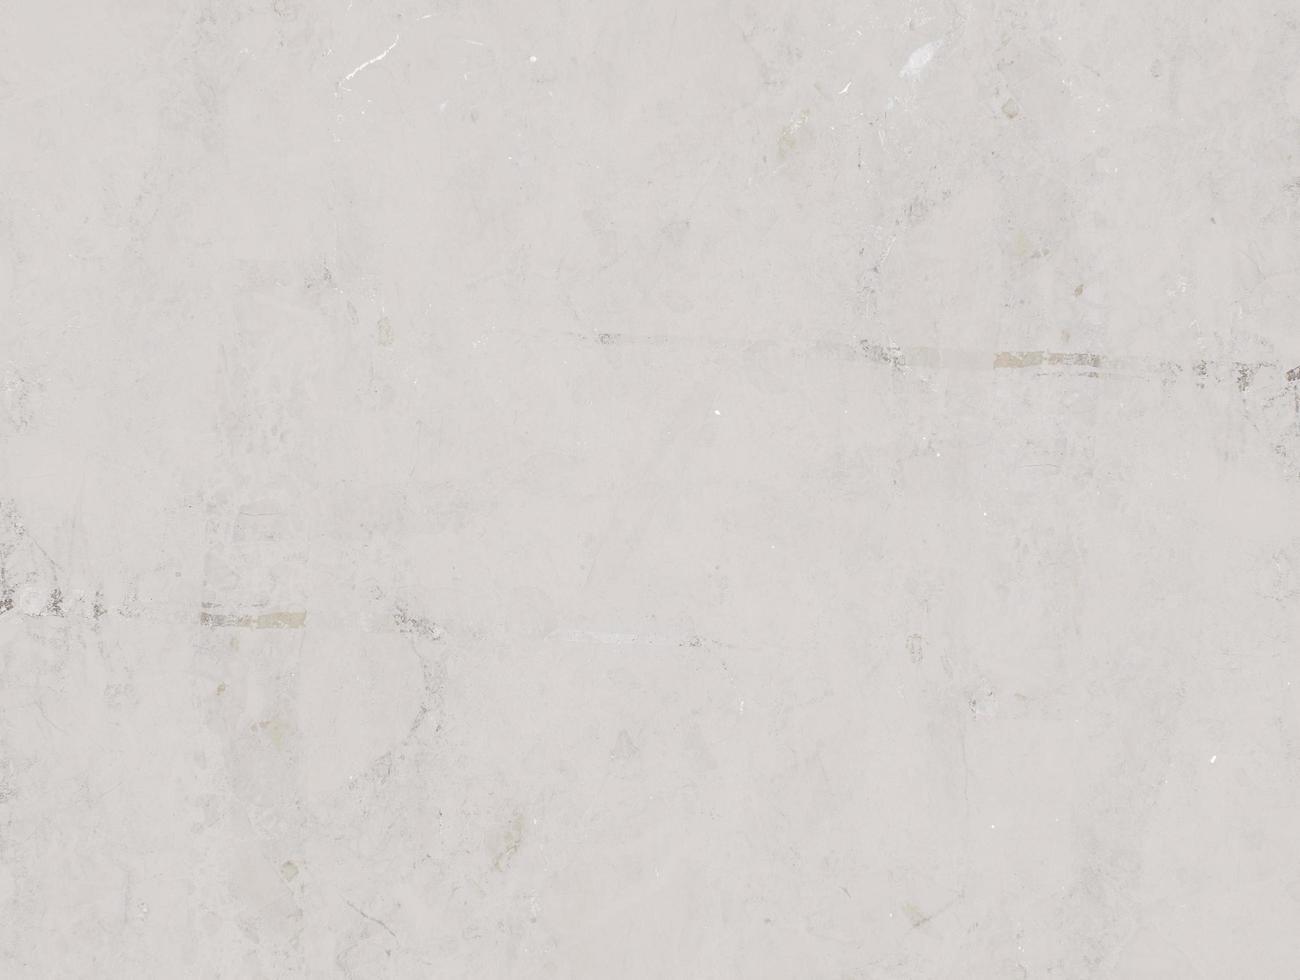 Fondo de textura de piedra neutra foto